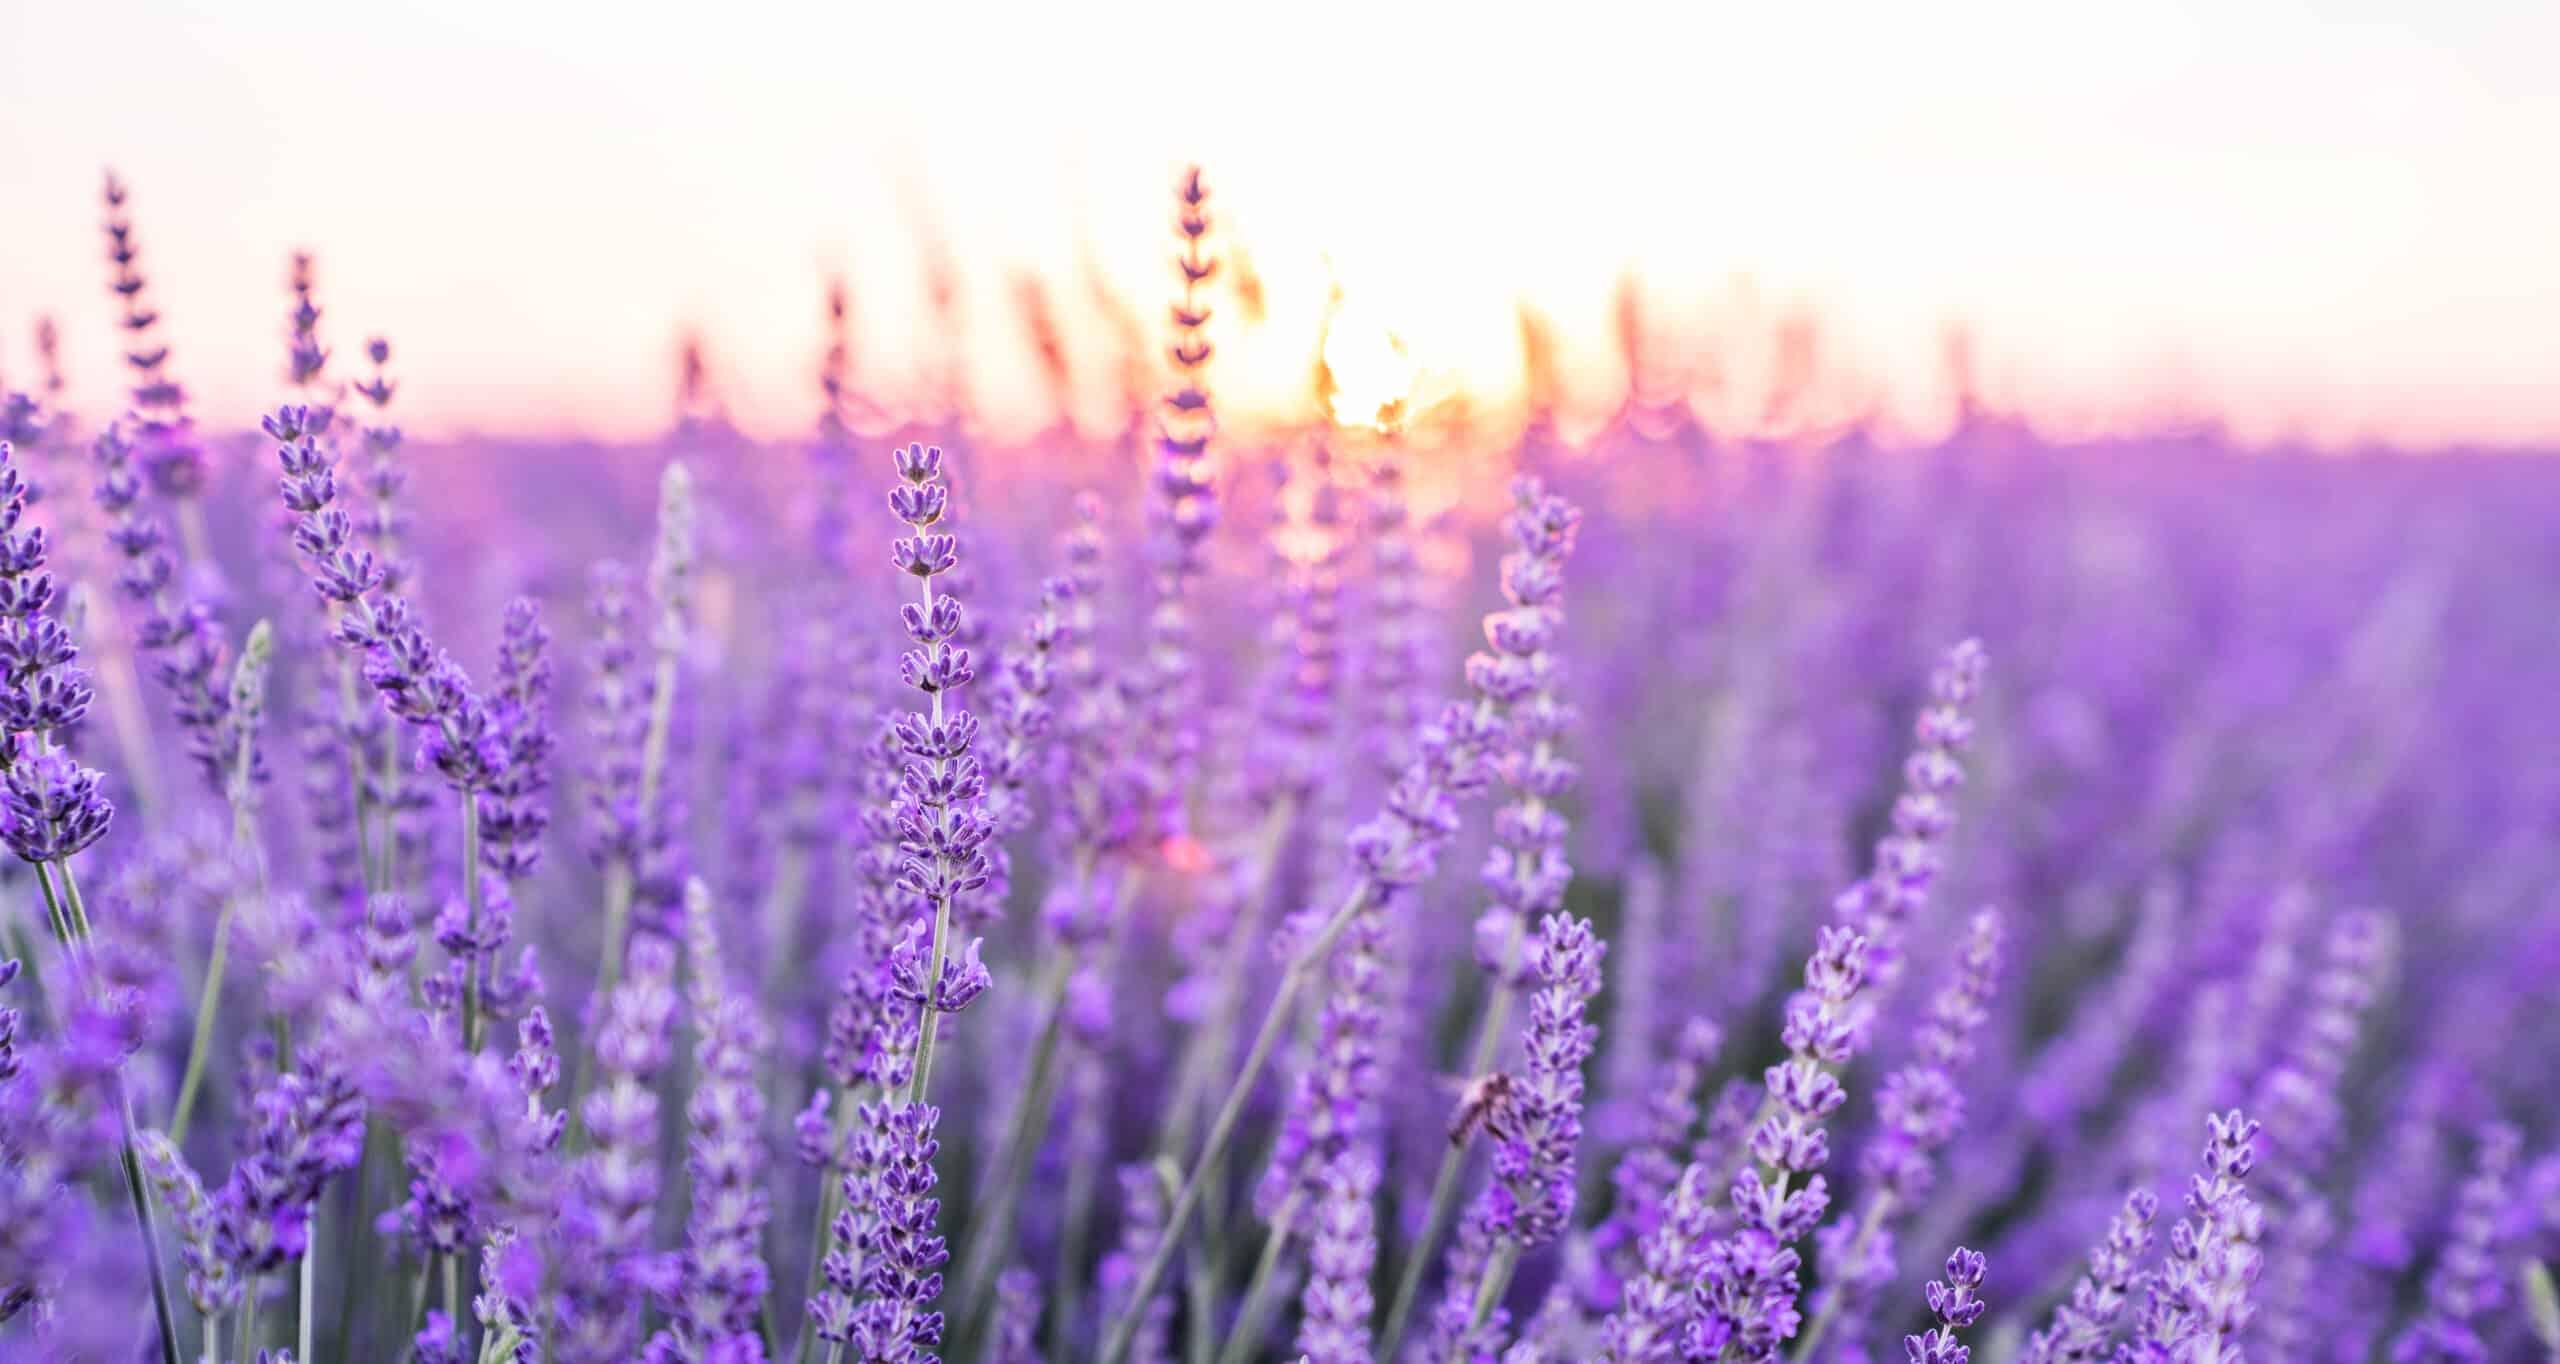 Best Smelling Plants, Garden Ideas, Gardening Ideas, Plants, Plant Care, Indoor Gardening, Indoor Garden, Houseplant Care